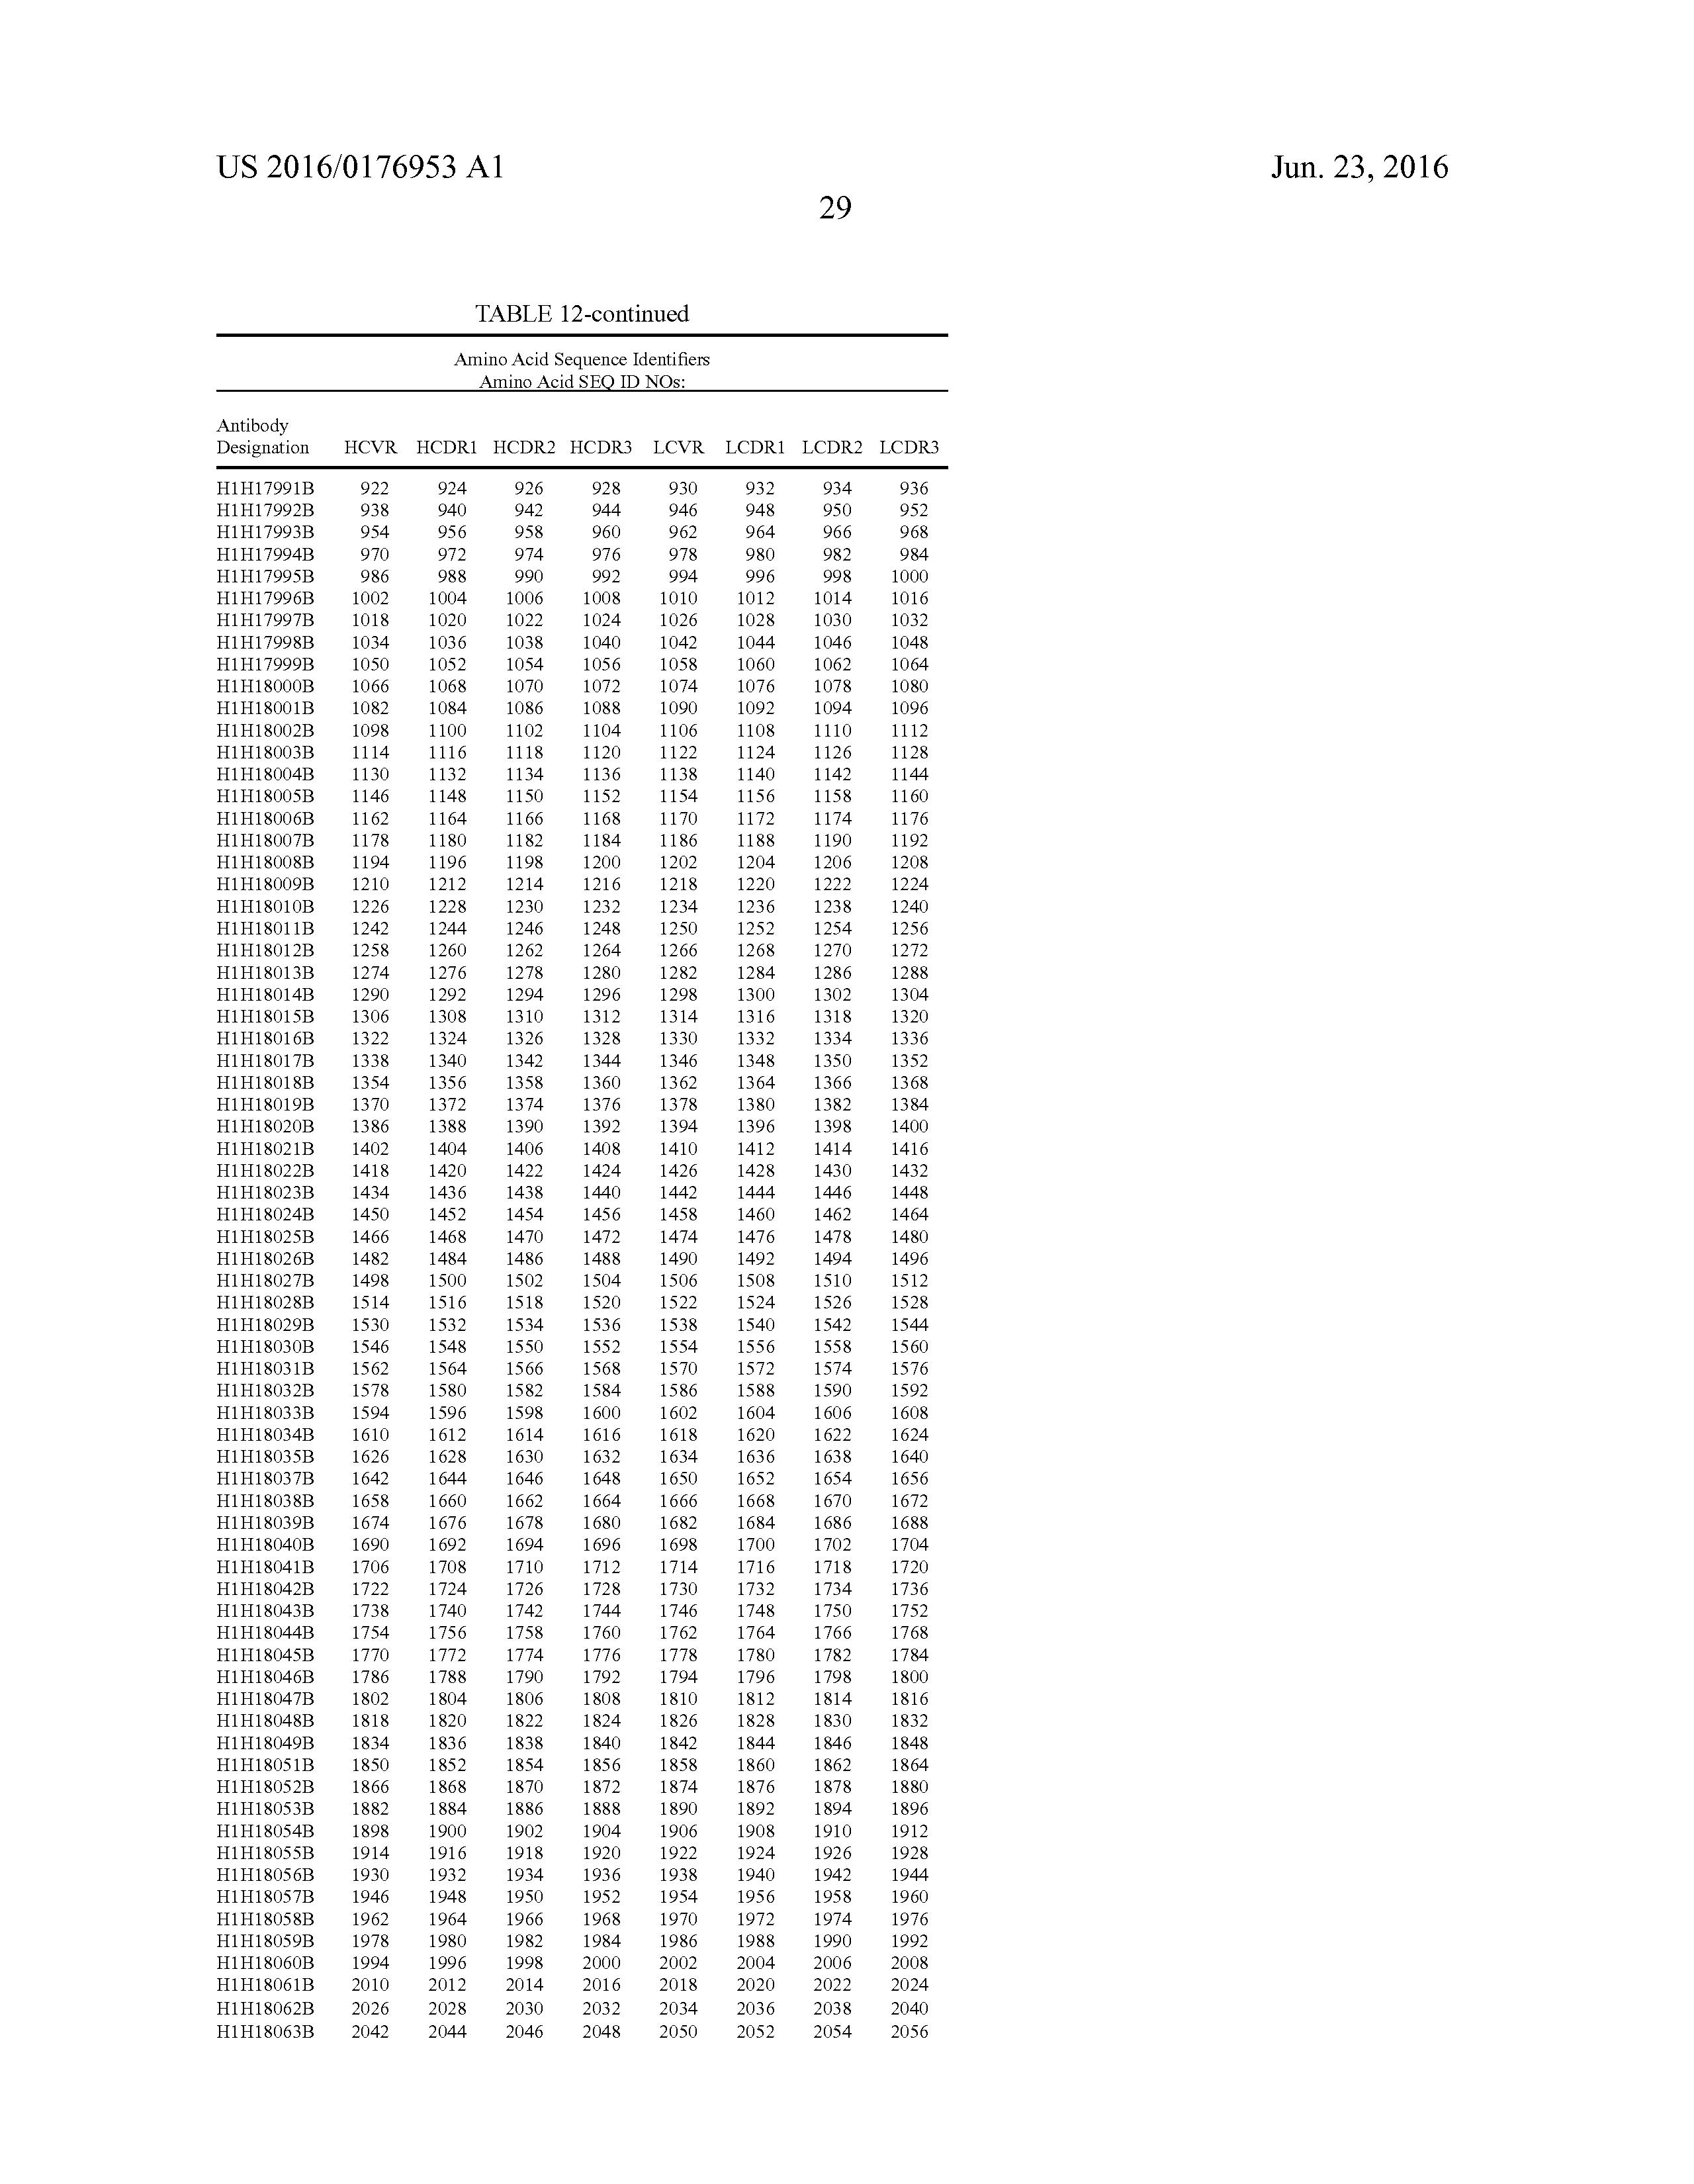 SG 11201704212S A - Human Antibodies To Influenza